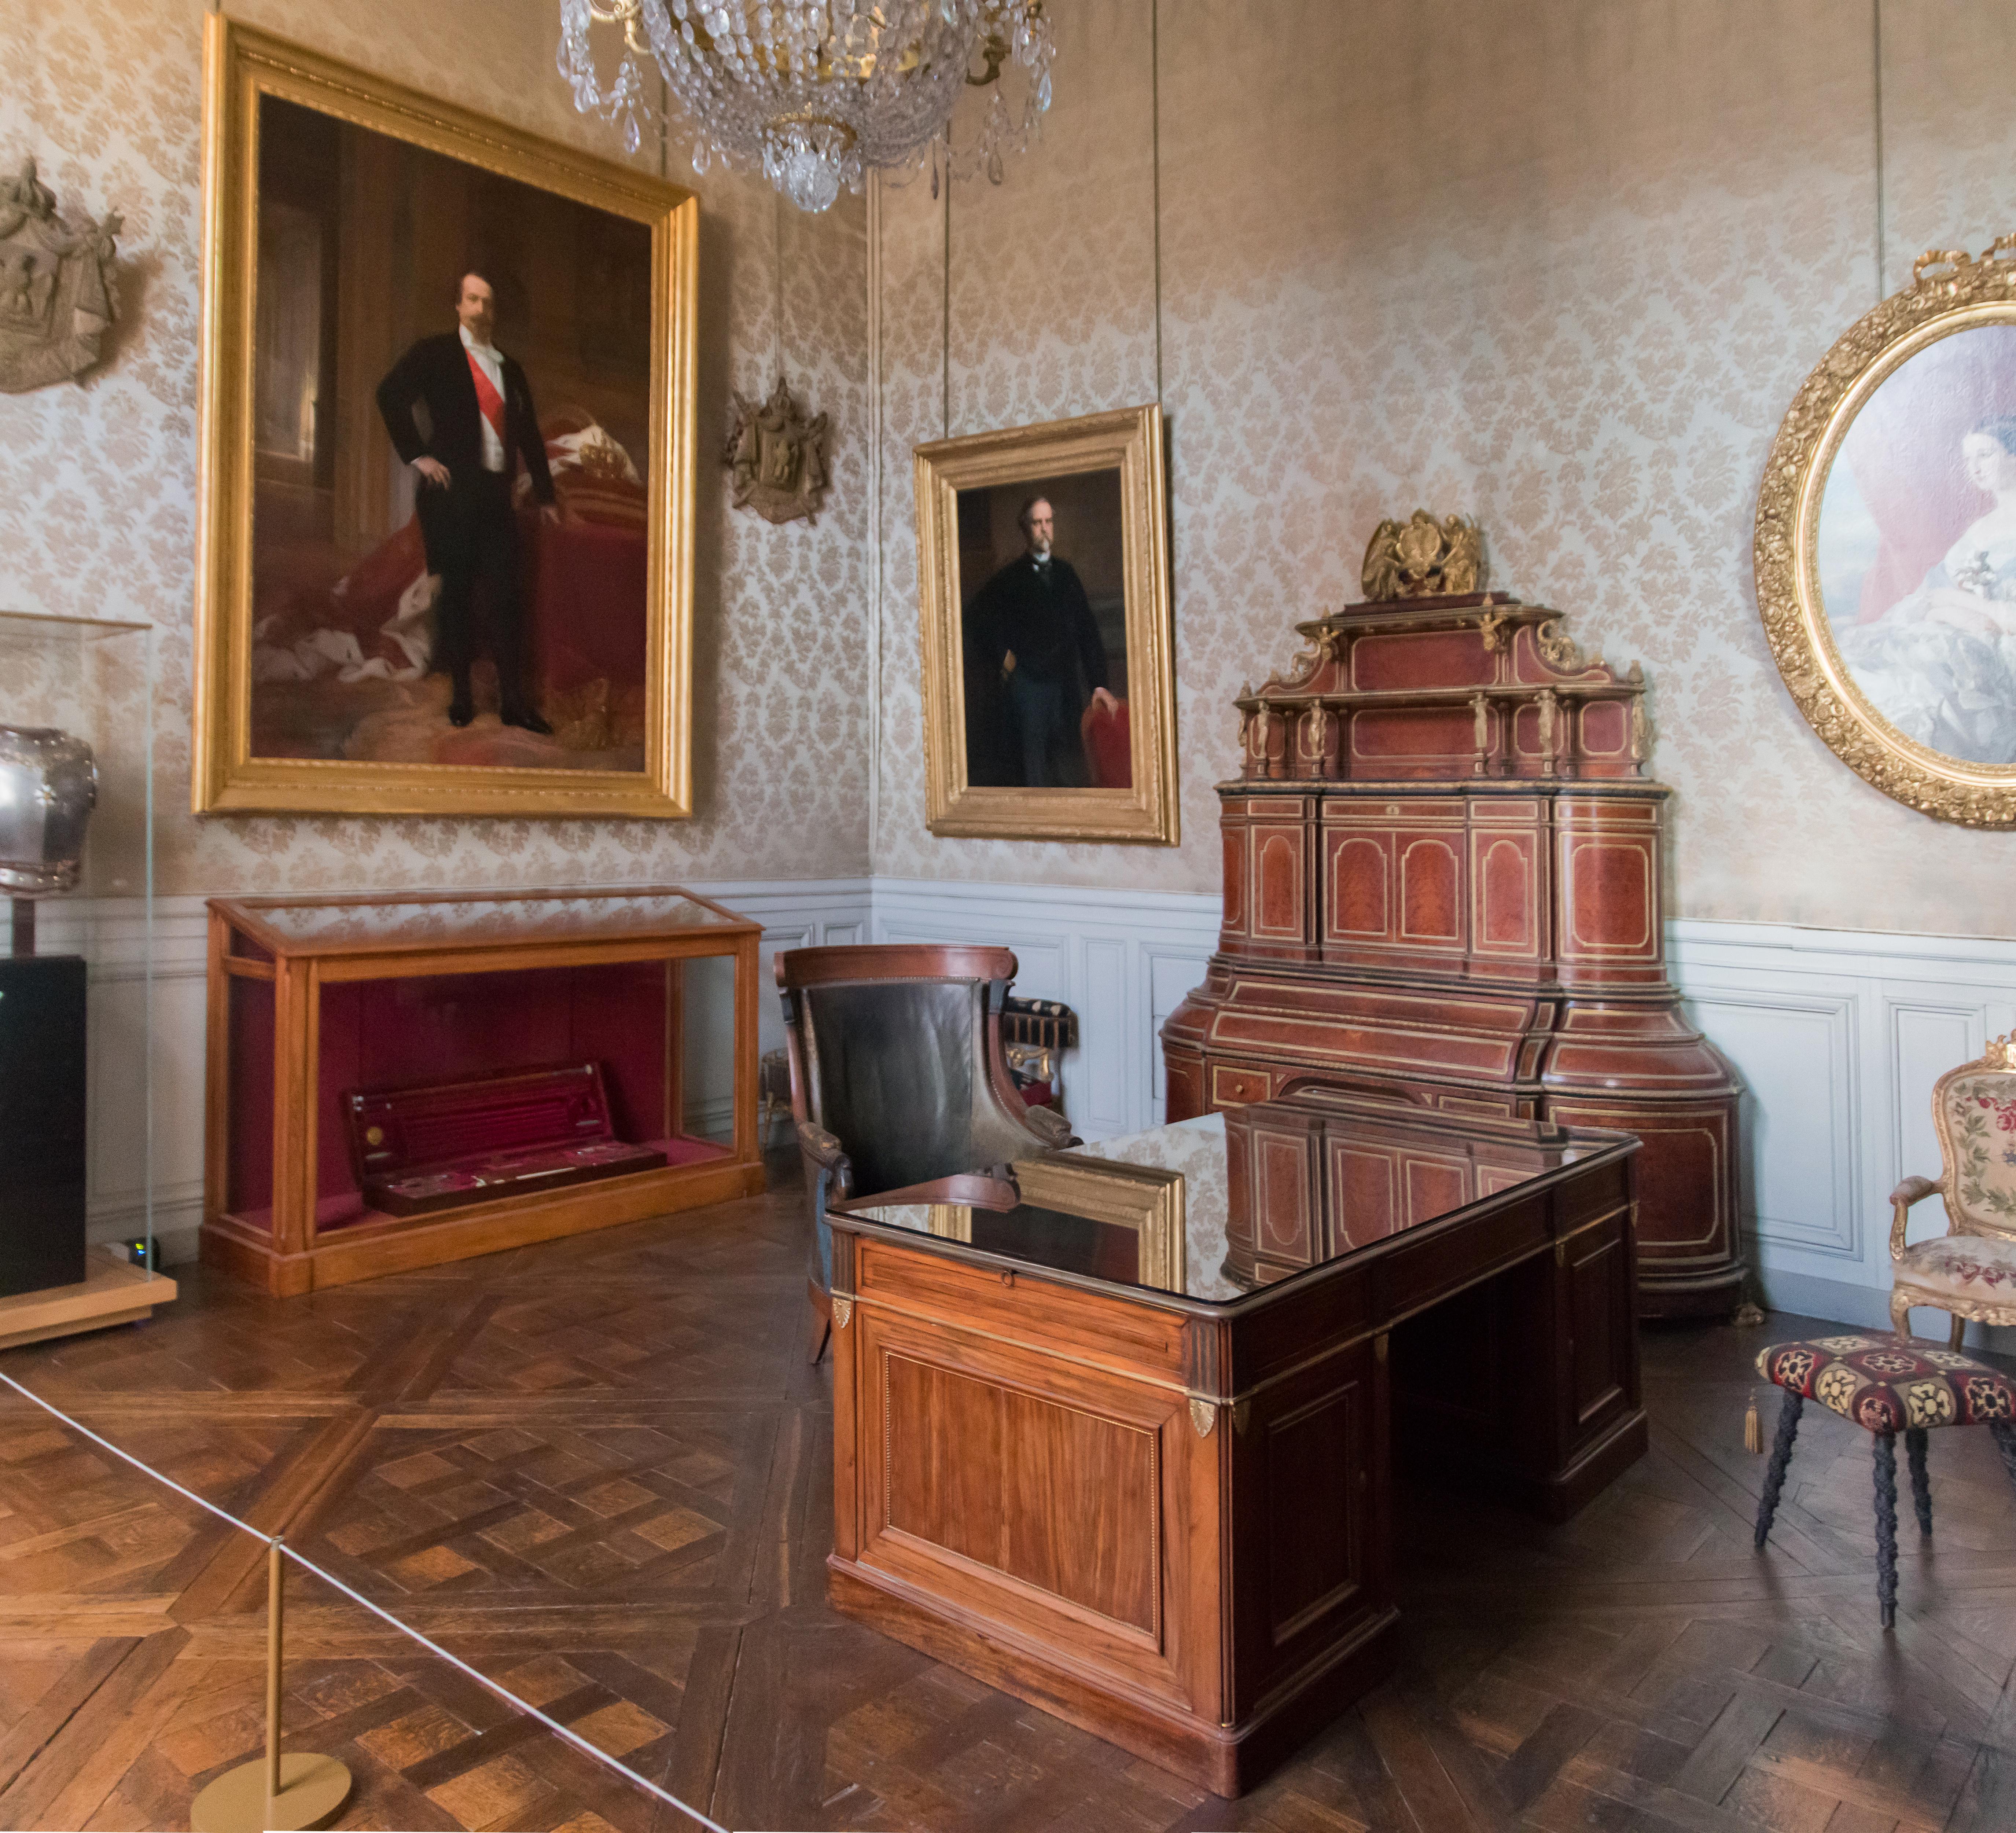 File:Musée Du Second Empire Salle Napoléon III 20150303